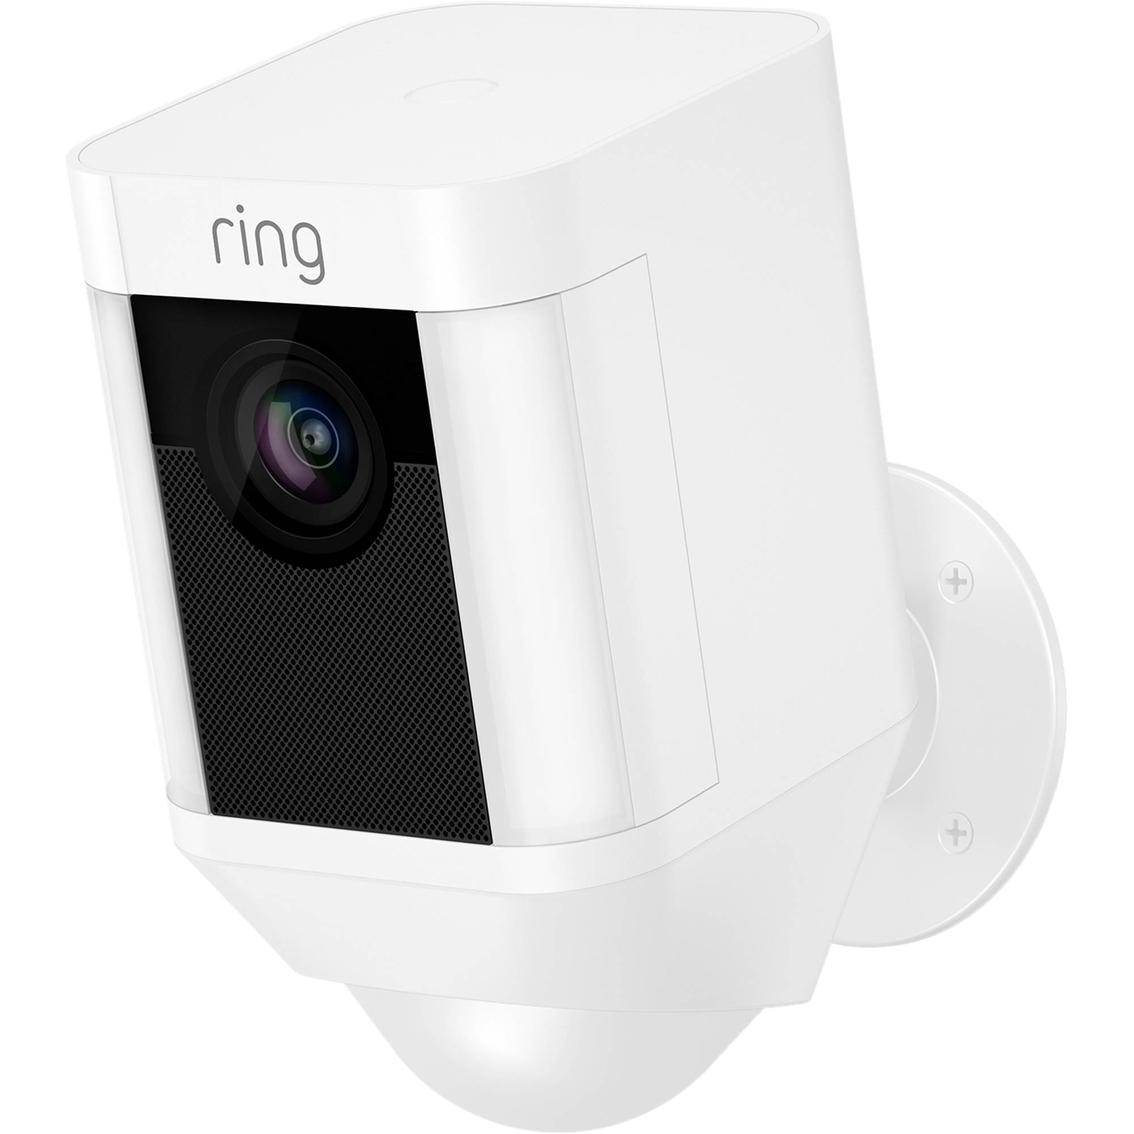 Ring Spotlight Battery Powered Camera Smart Home